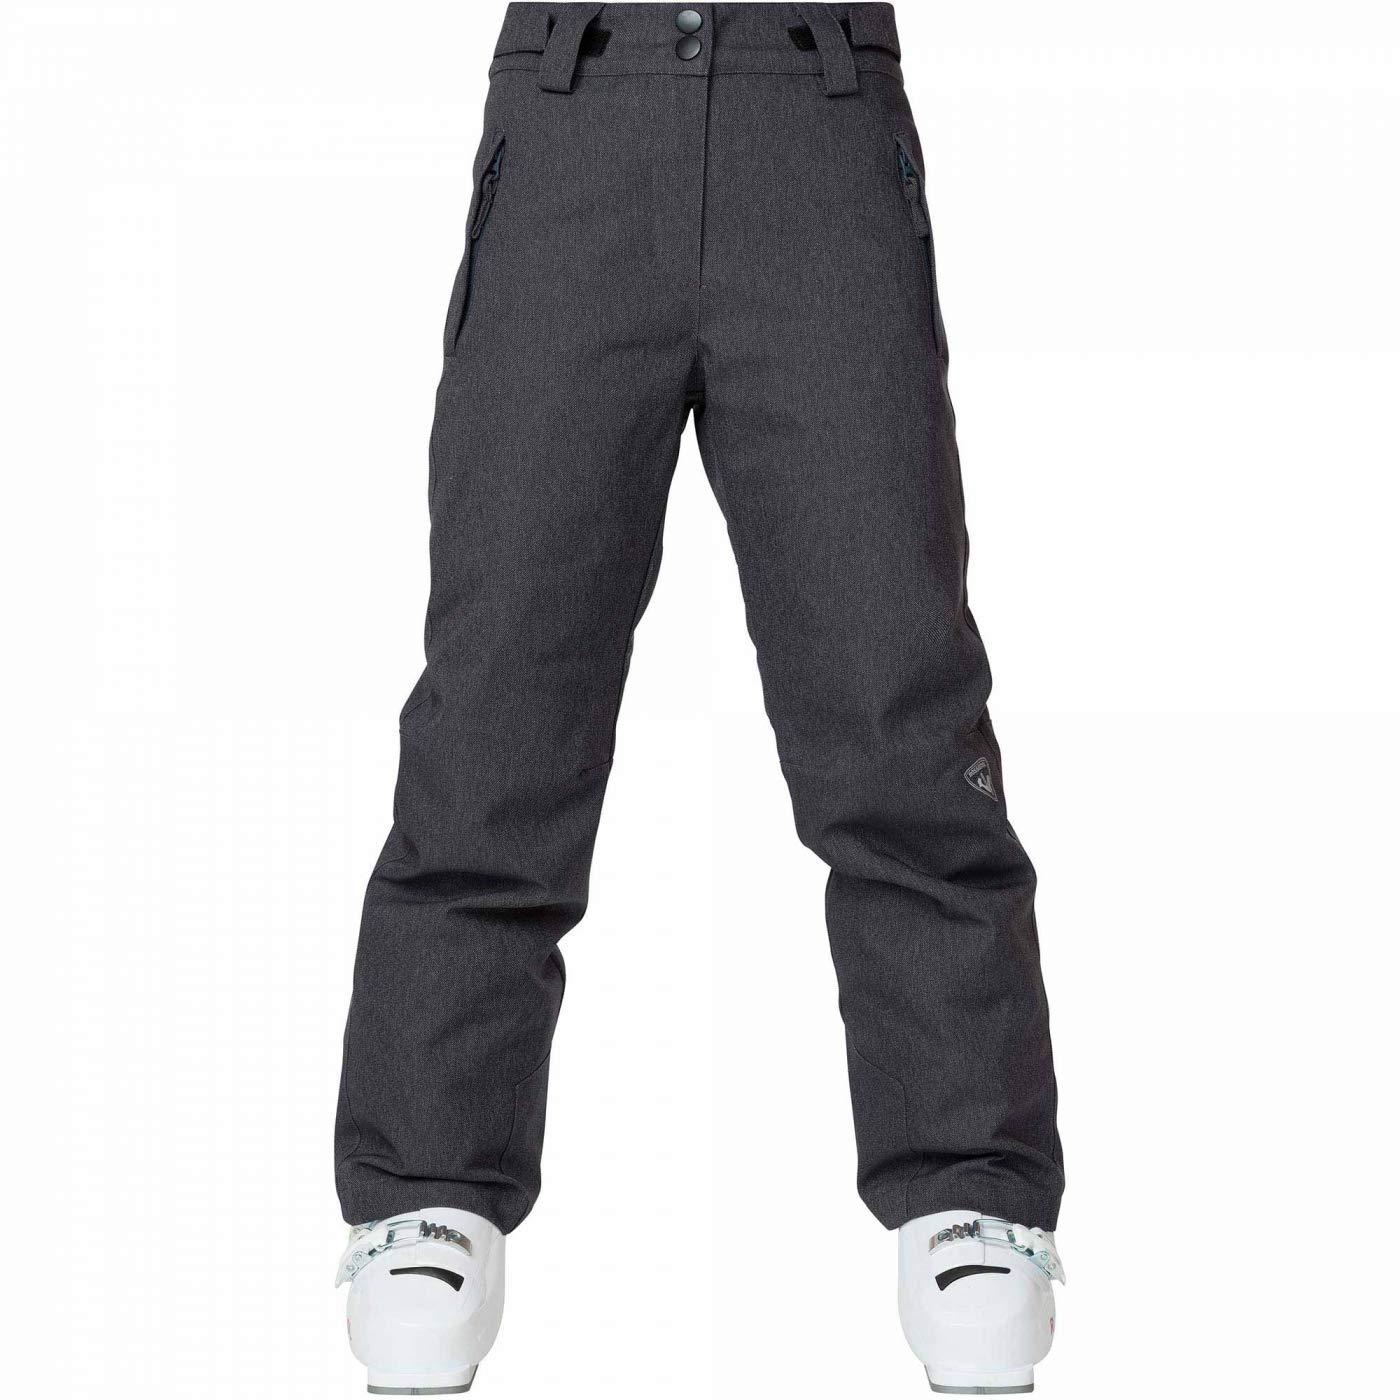 Rossignol Cheap Girls Ski Pants Under ($100)